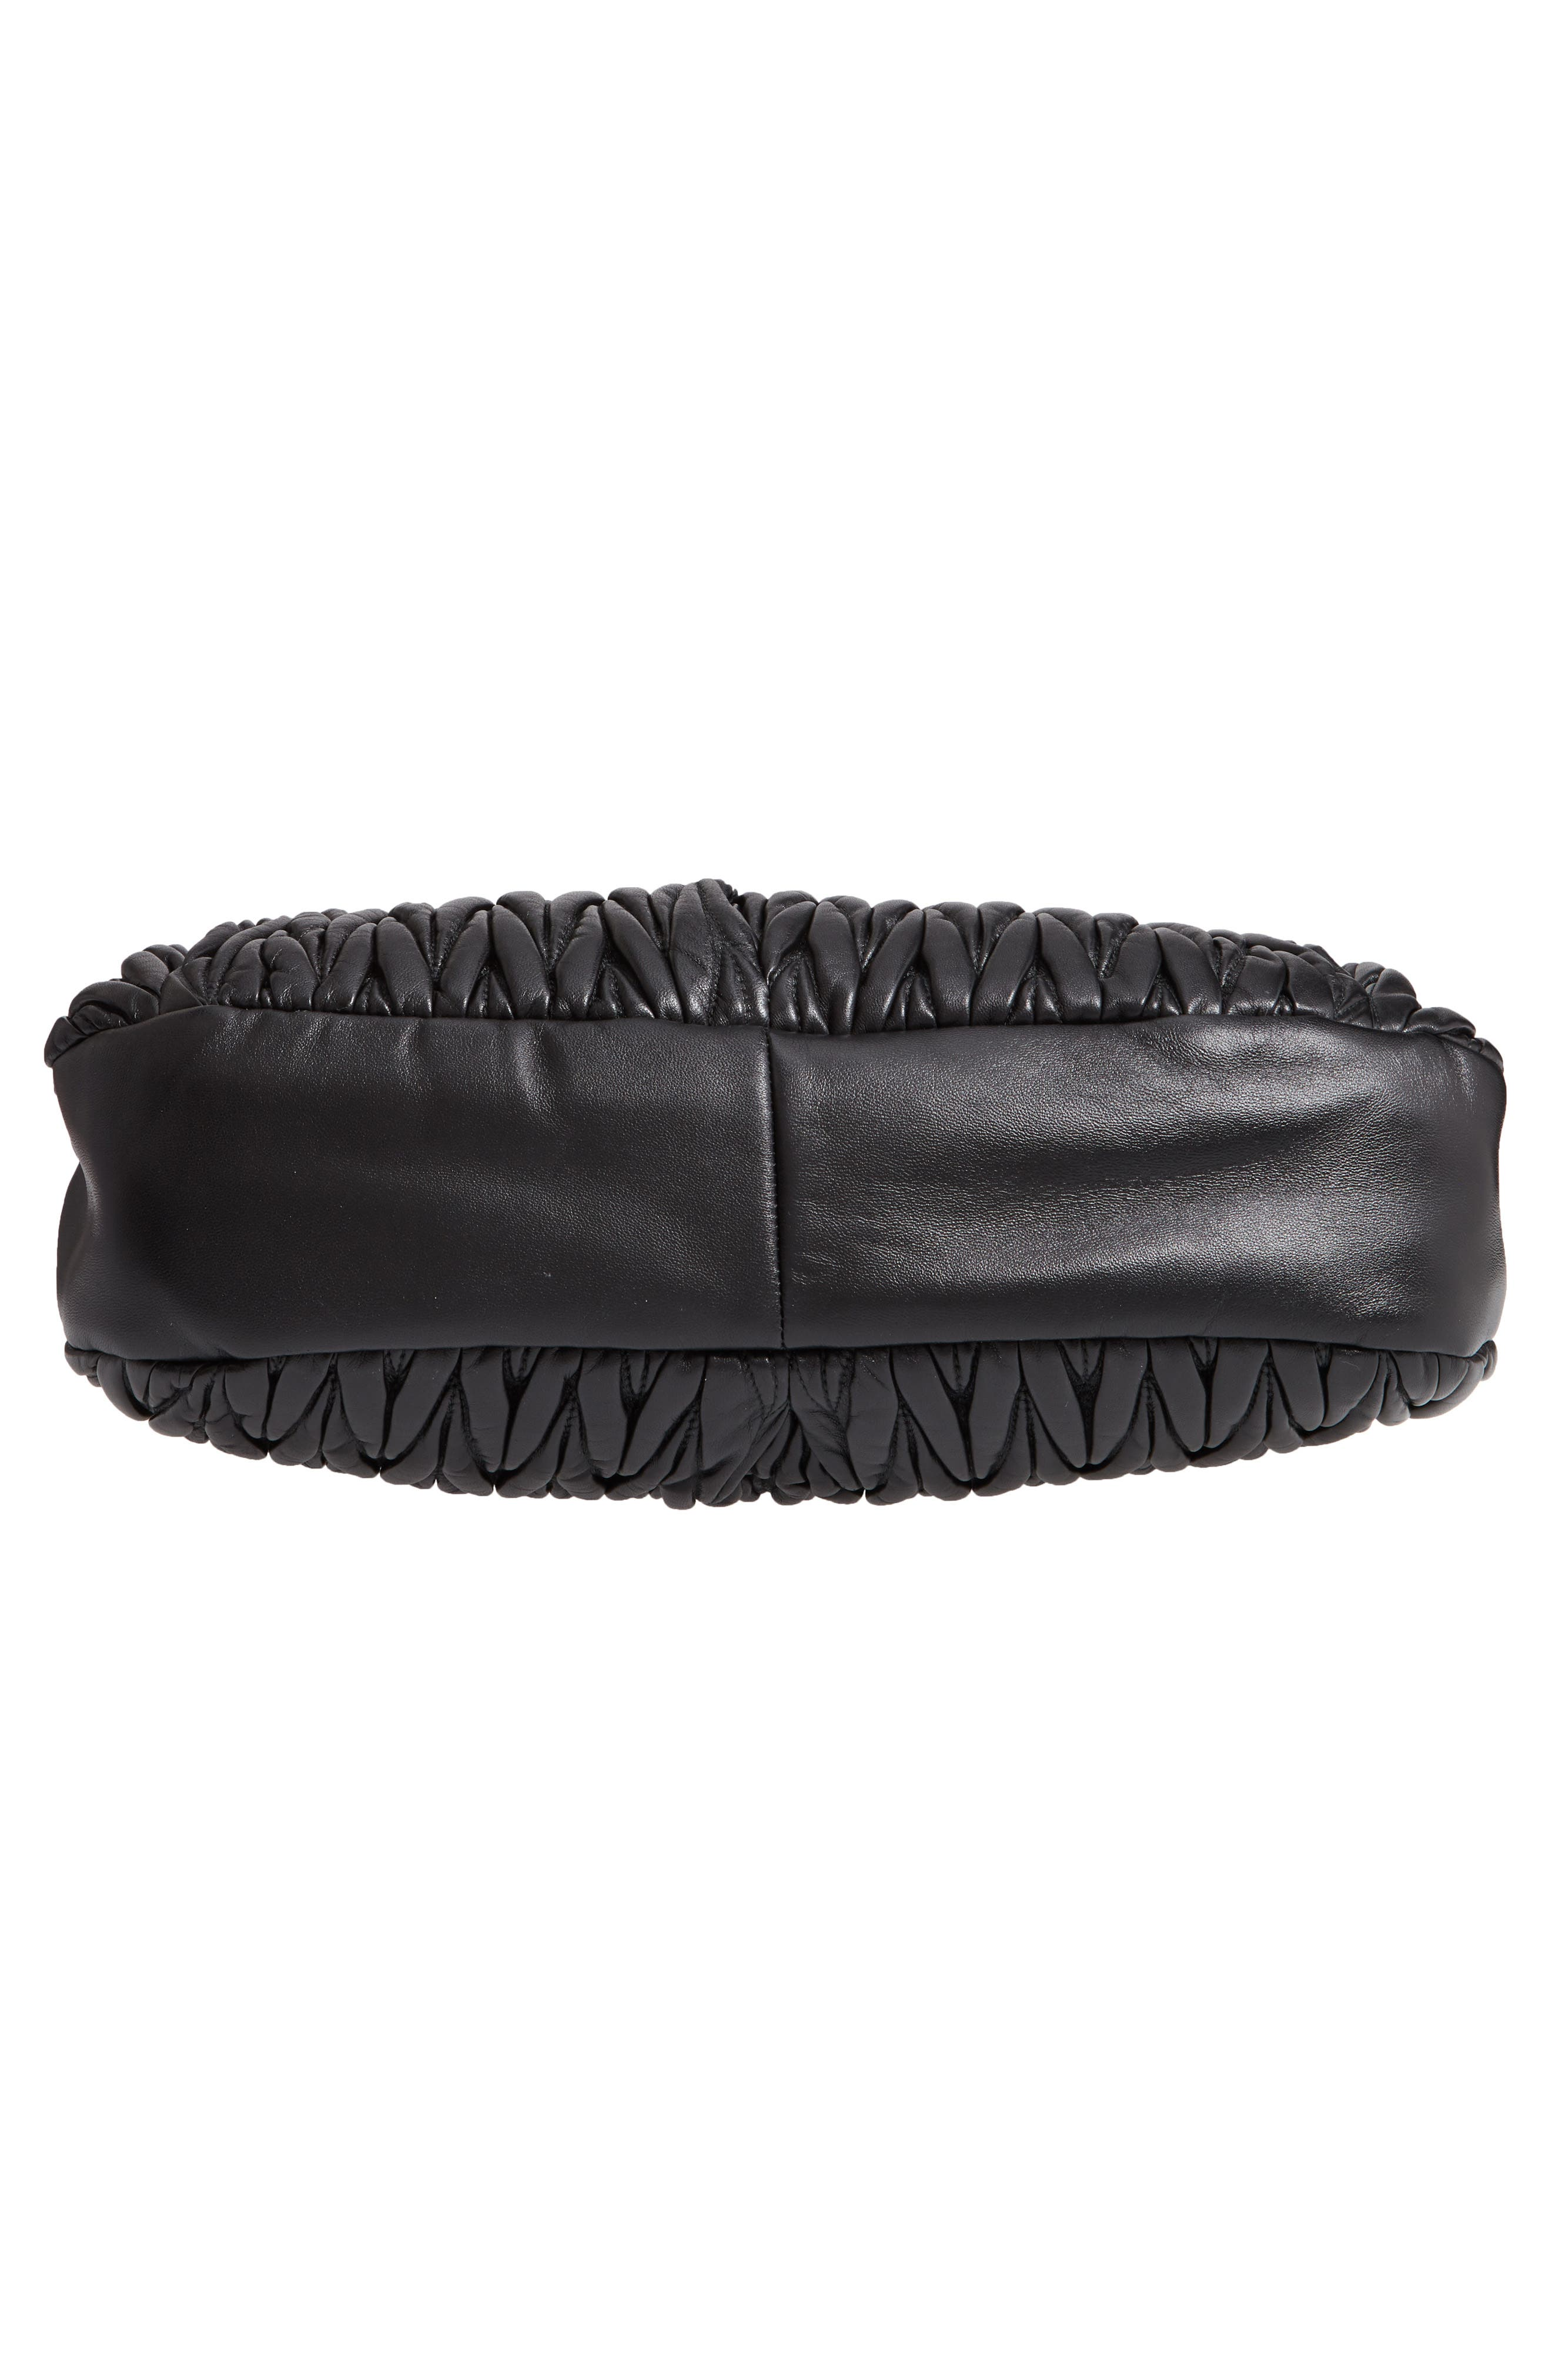 Matelassé Lambskin Leather Shoulder Bag,                             Alternate thumbnail 6, color,                             NERO